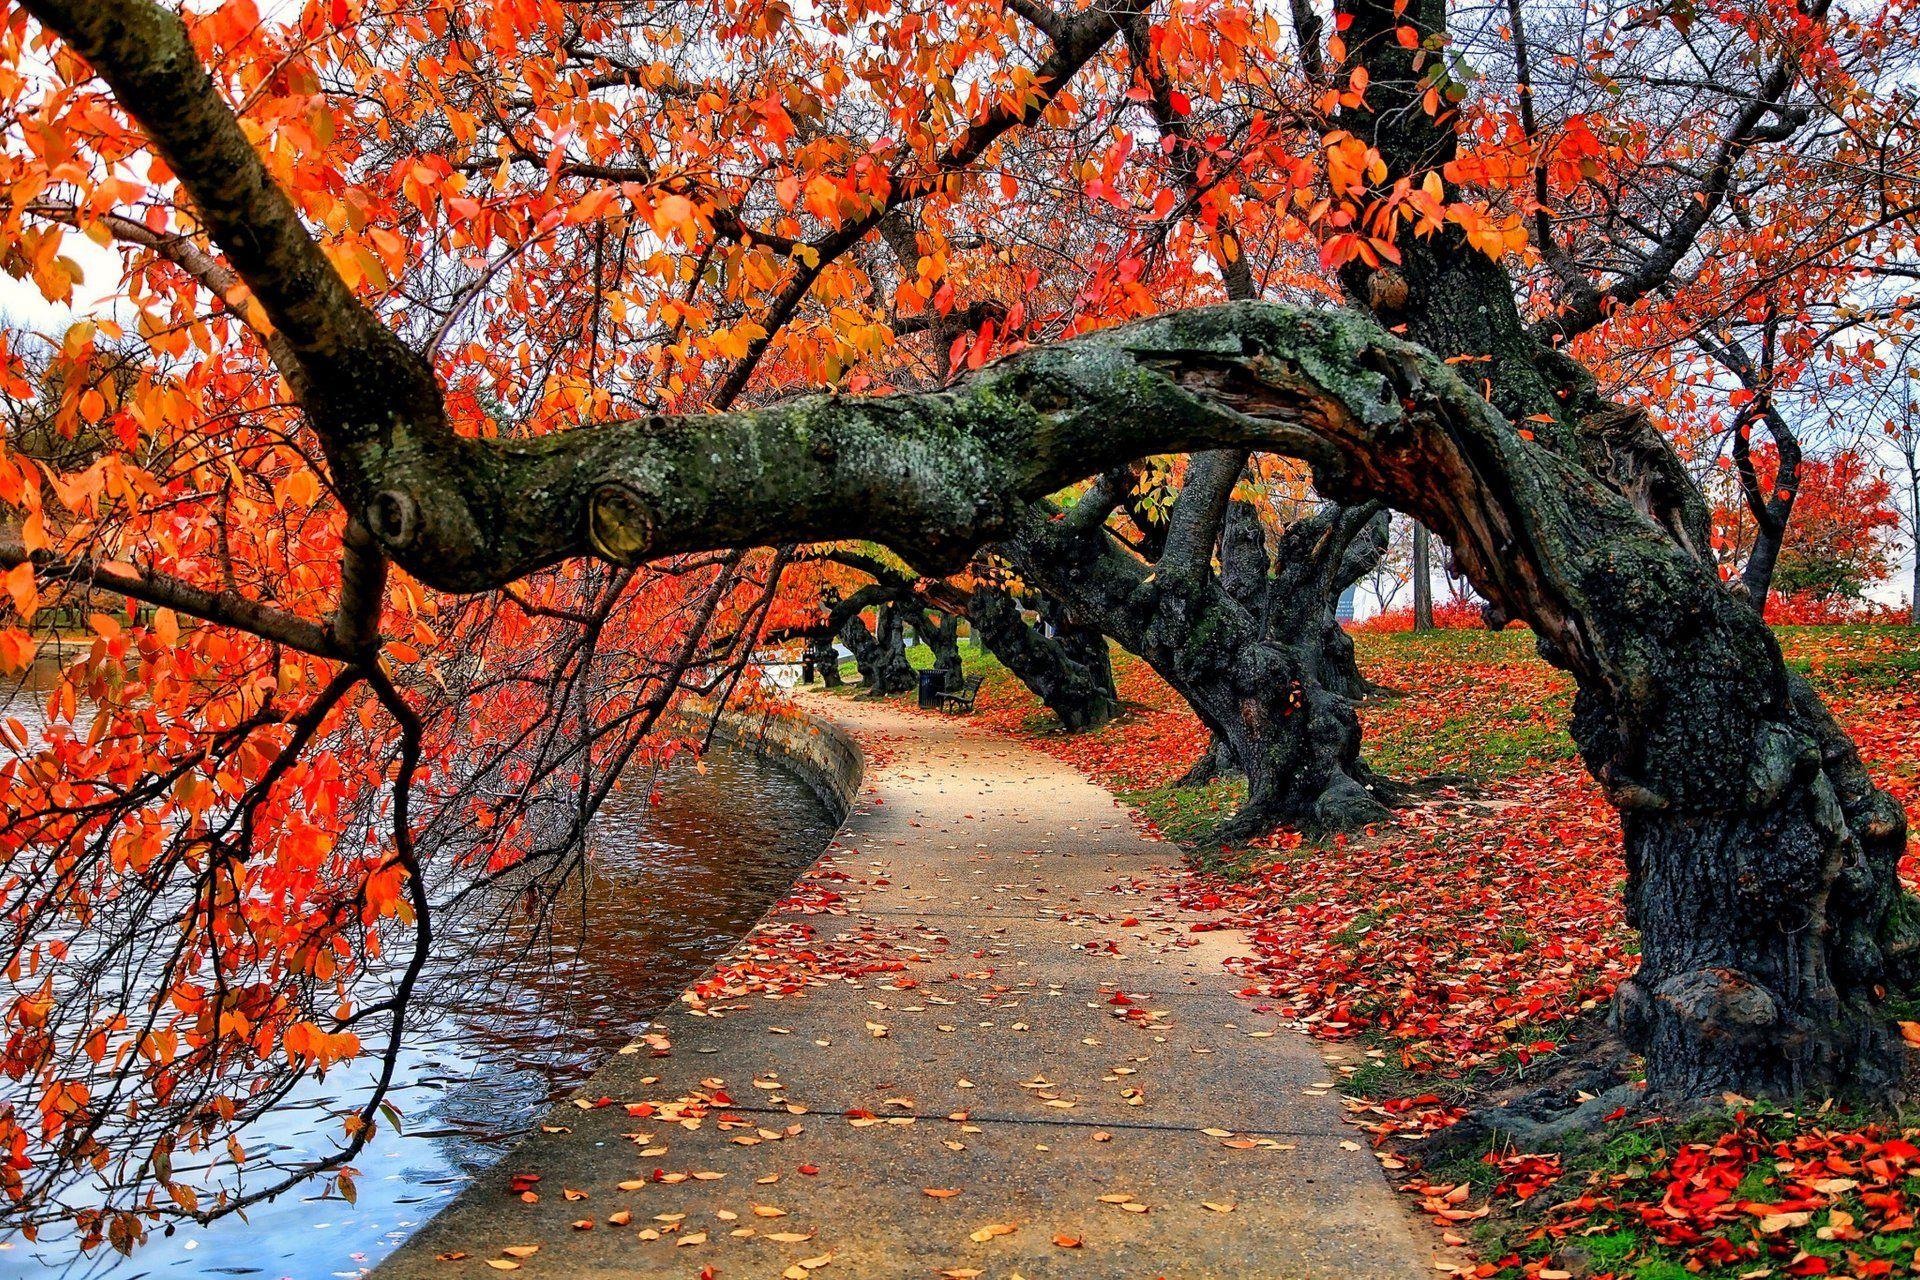 autumn trees road wallpaper. | hd wallpapers | pinterest | iphone